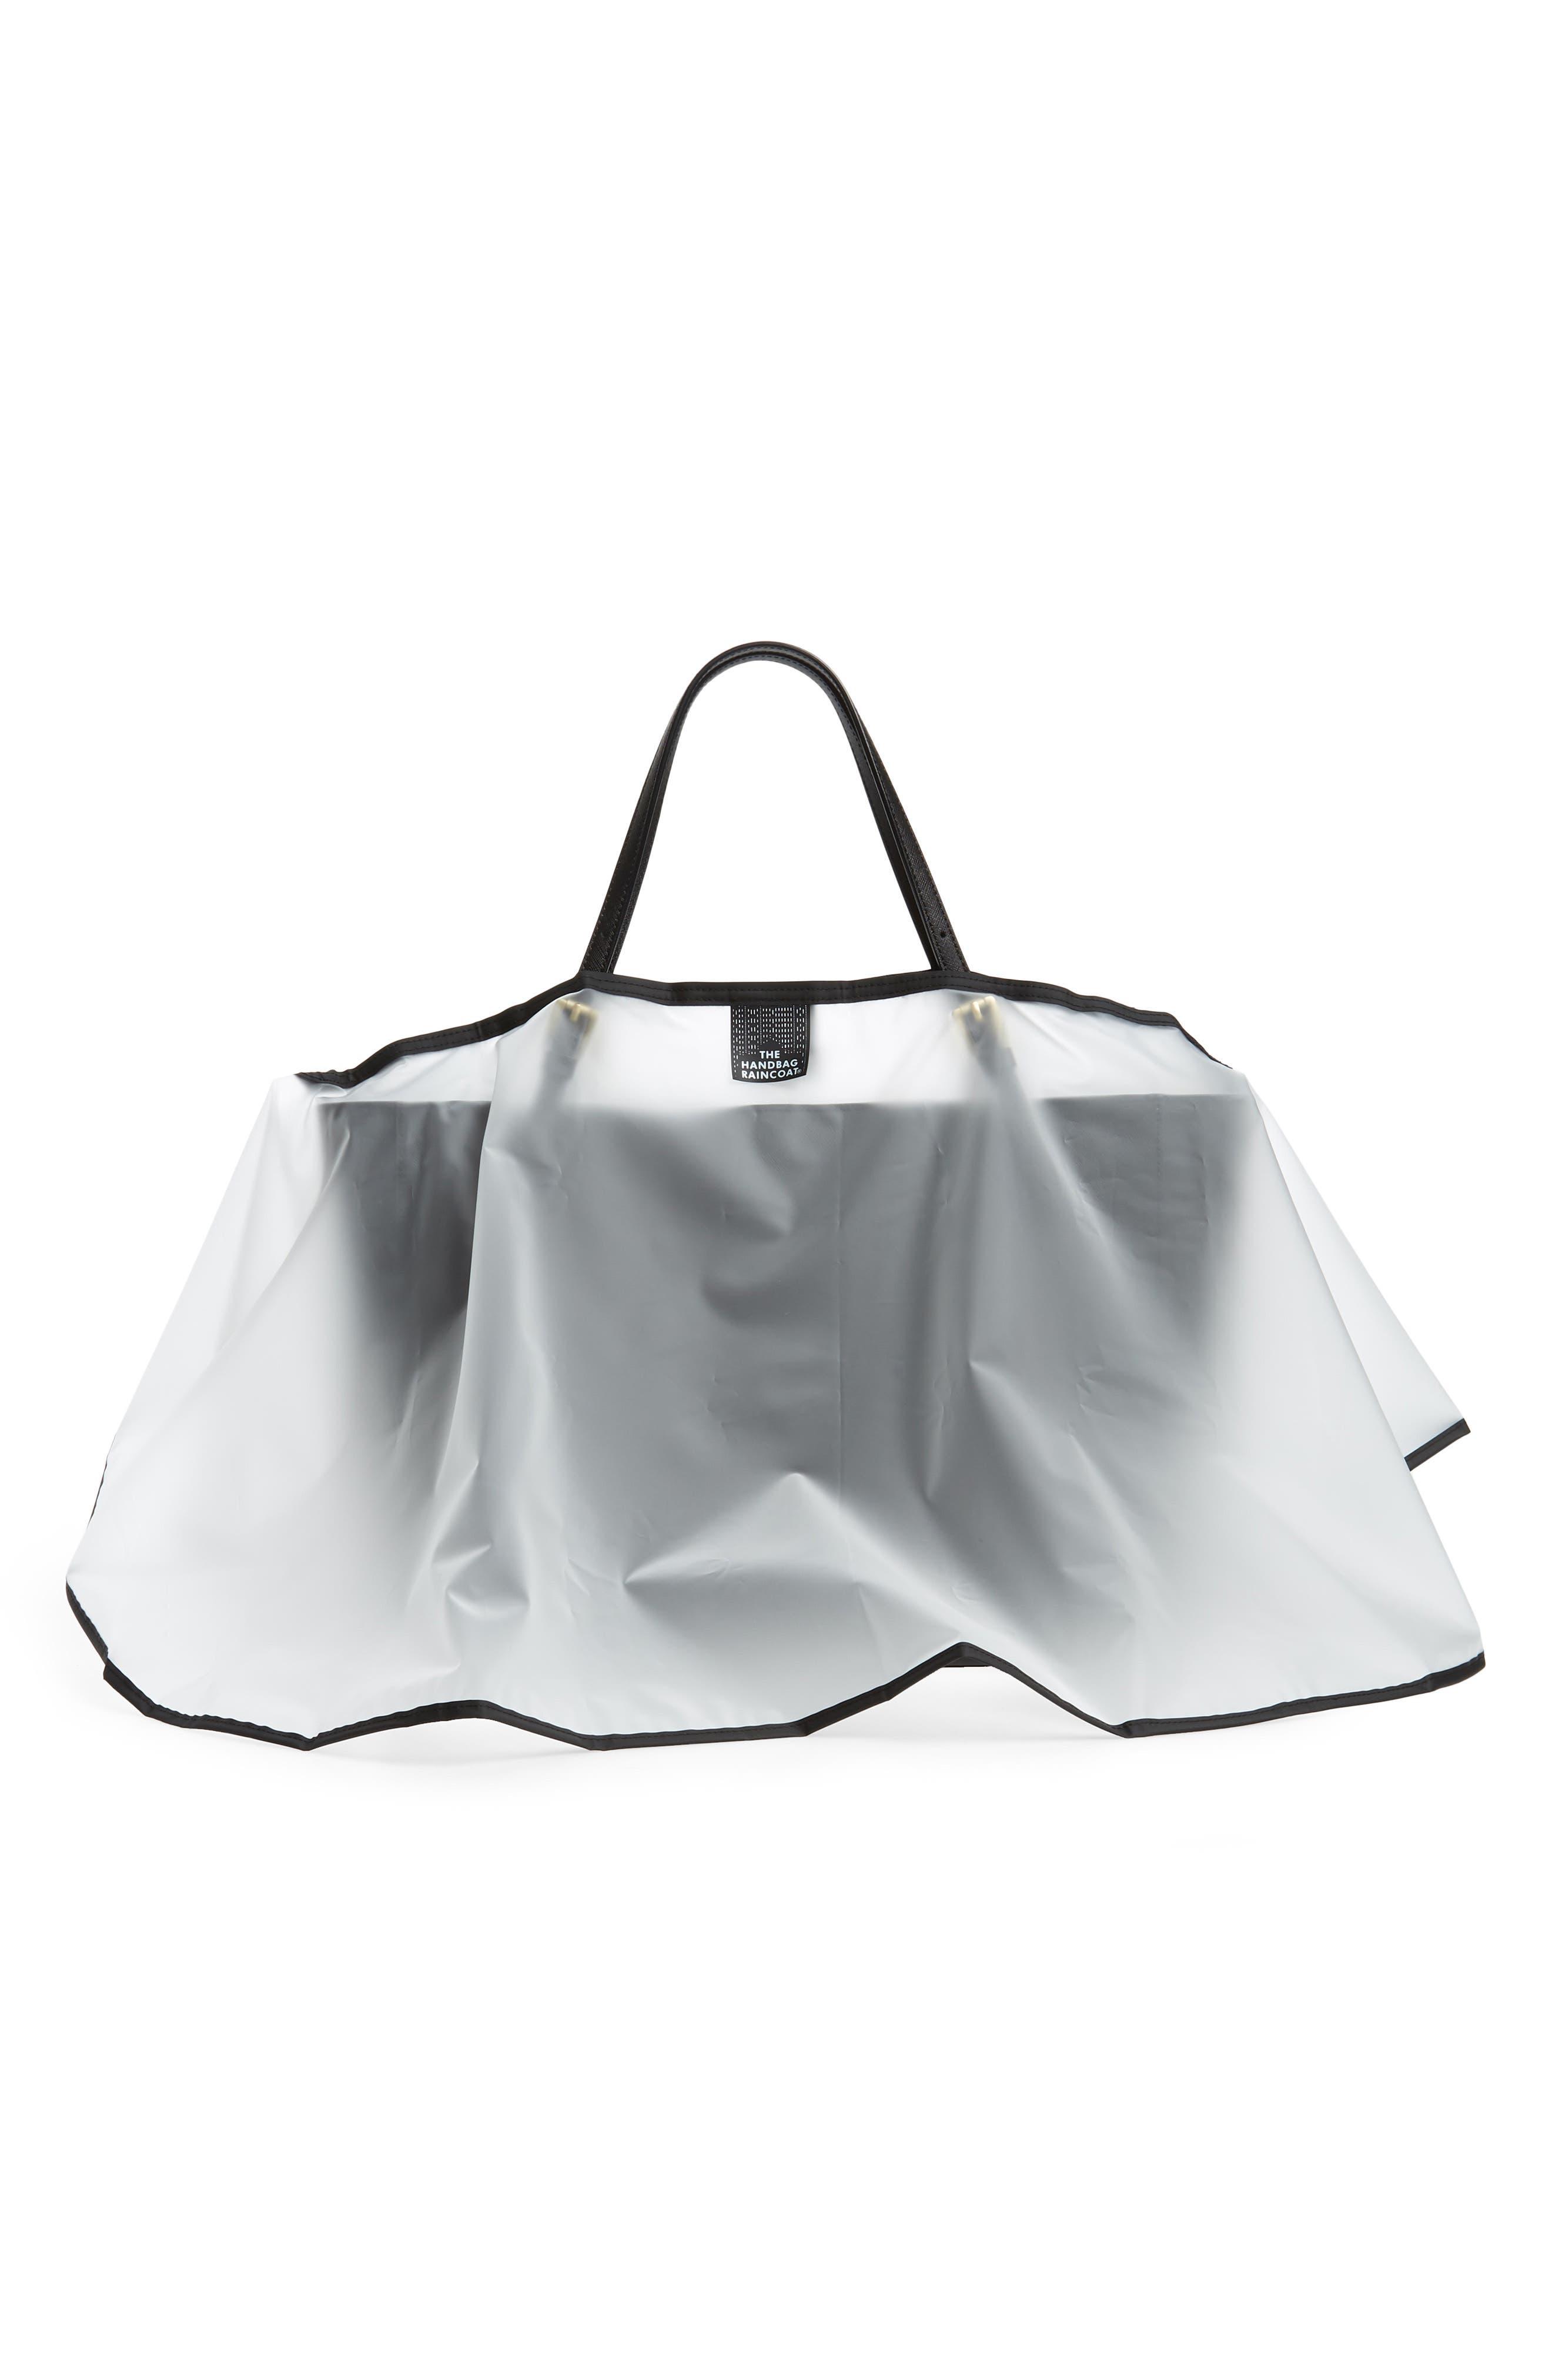 Maxi Clear Handbag Protector,                             Alternate thumbnail 2, color,                             Clear/ Black